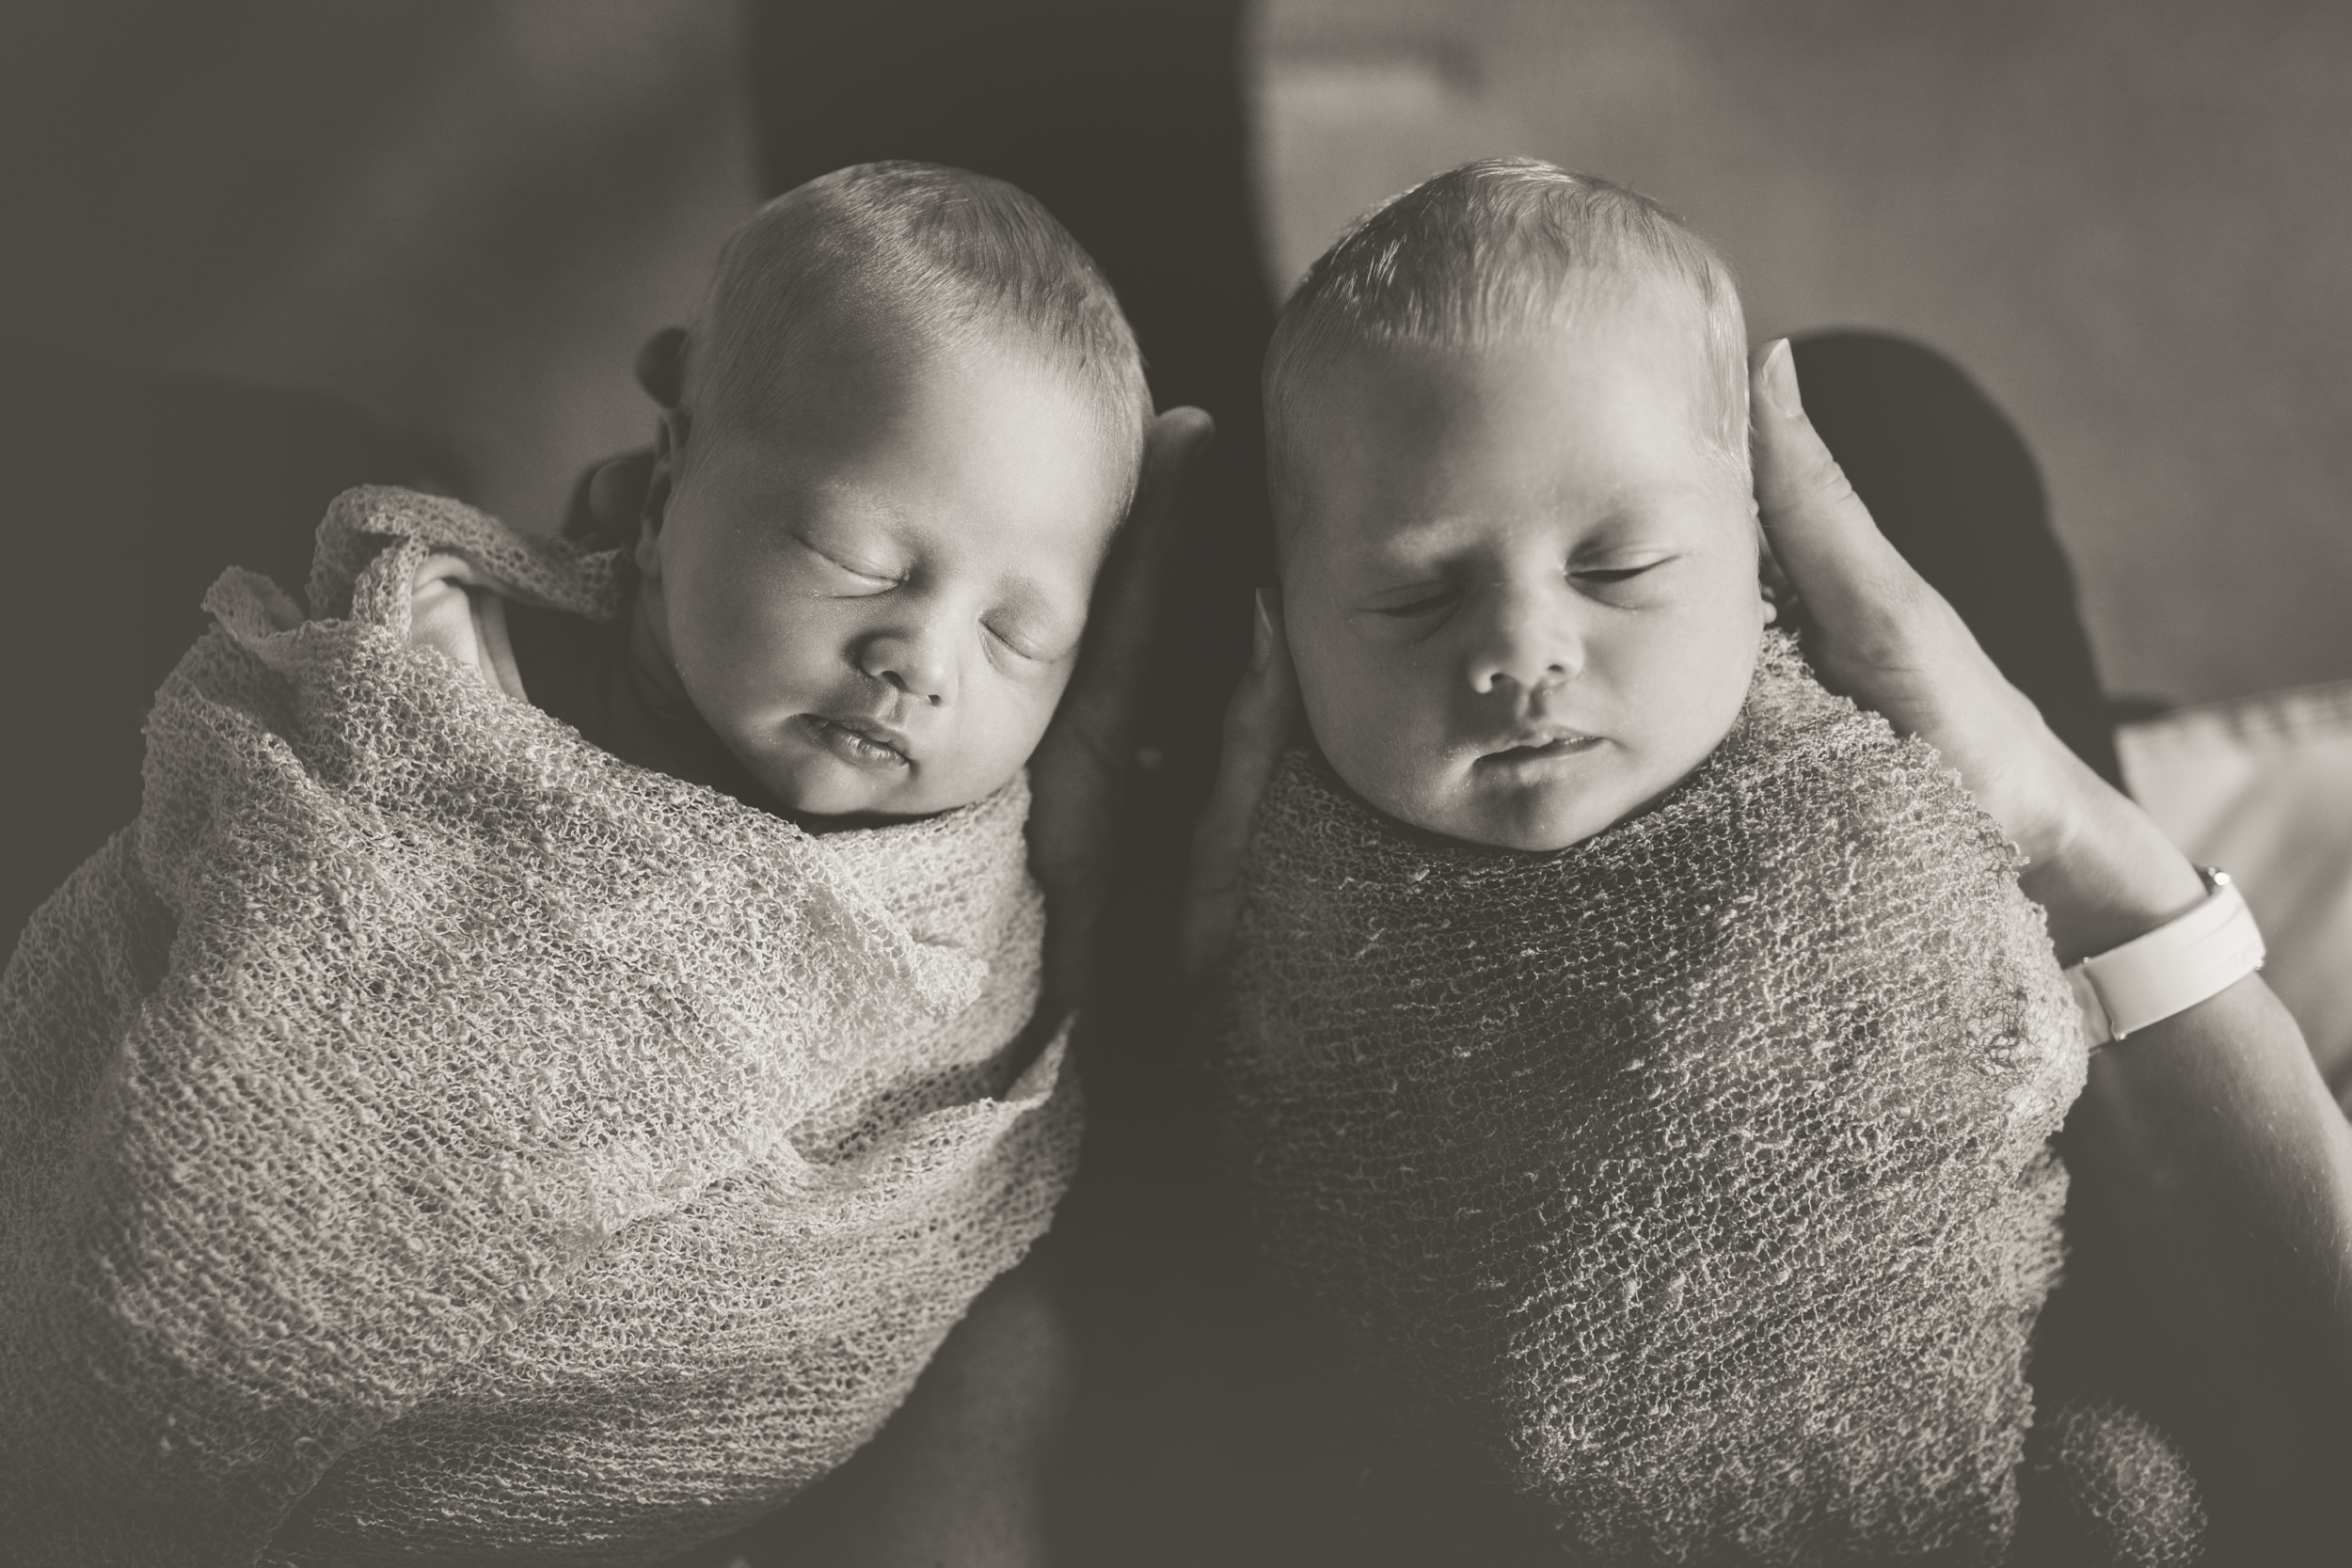 toronto lifestyle photographer ten2tenphotography 49 - Toronto Newborn Twin Photographer